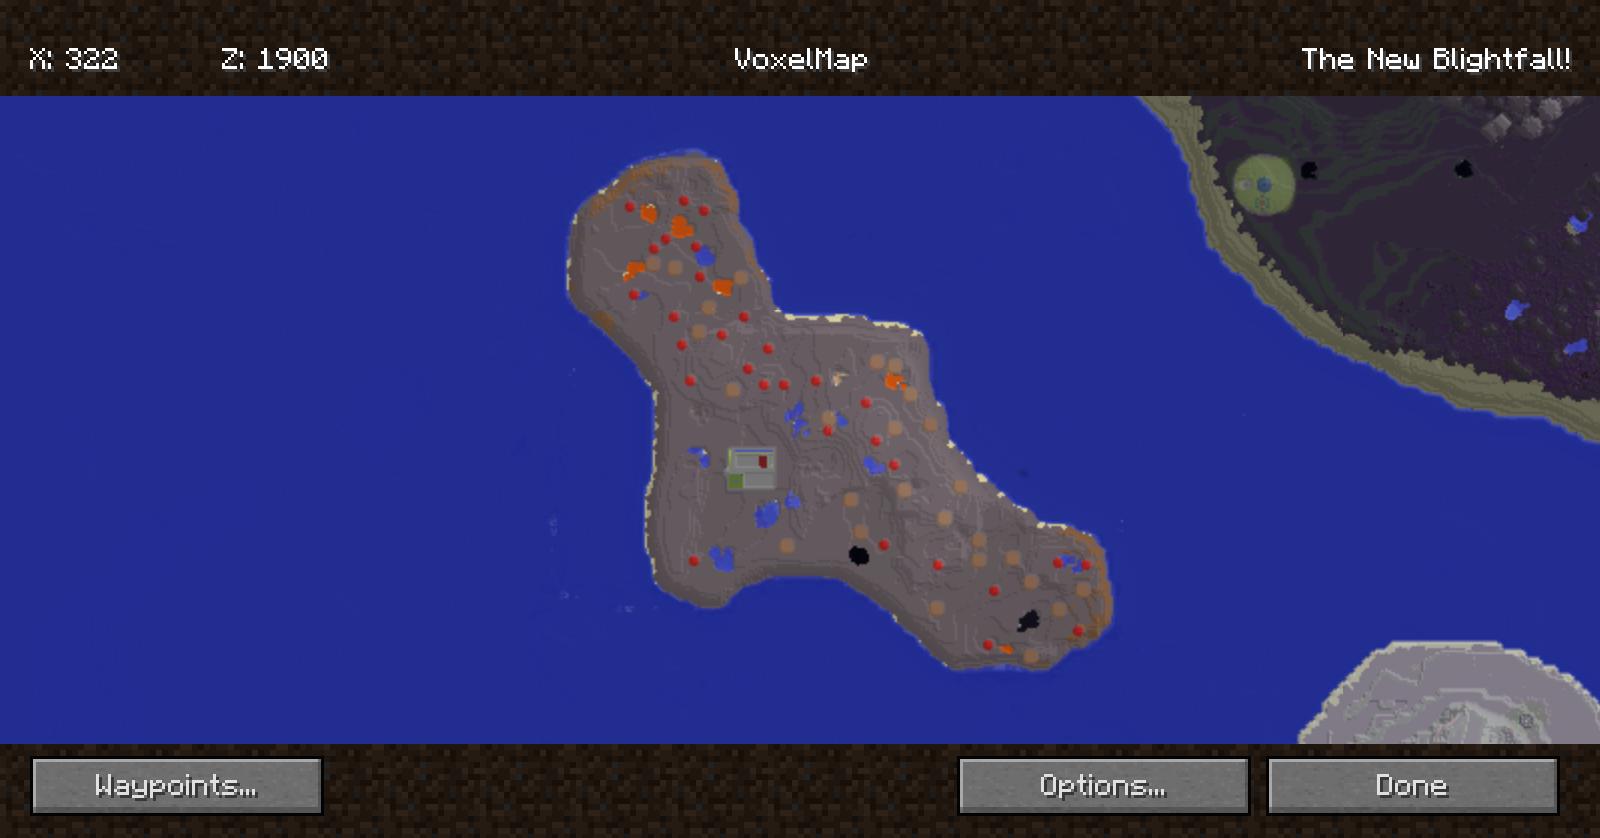 Blightfall Hqm Adventure Map V203a Mod Packs Minecraft Mods